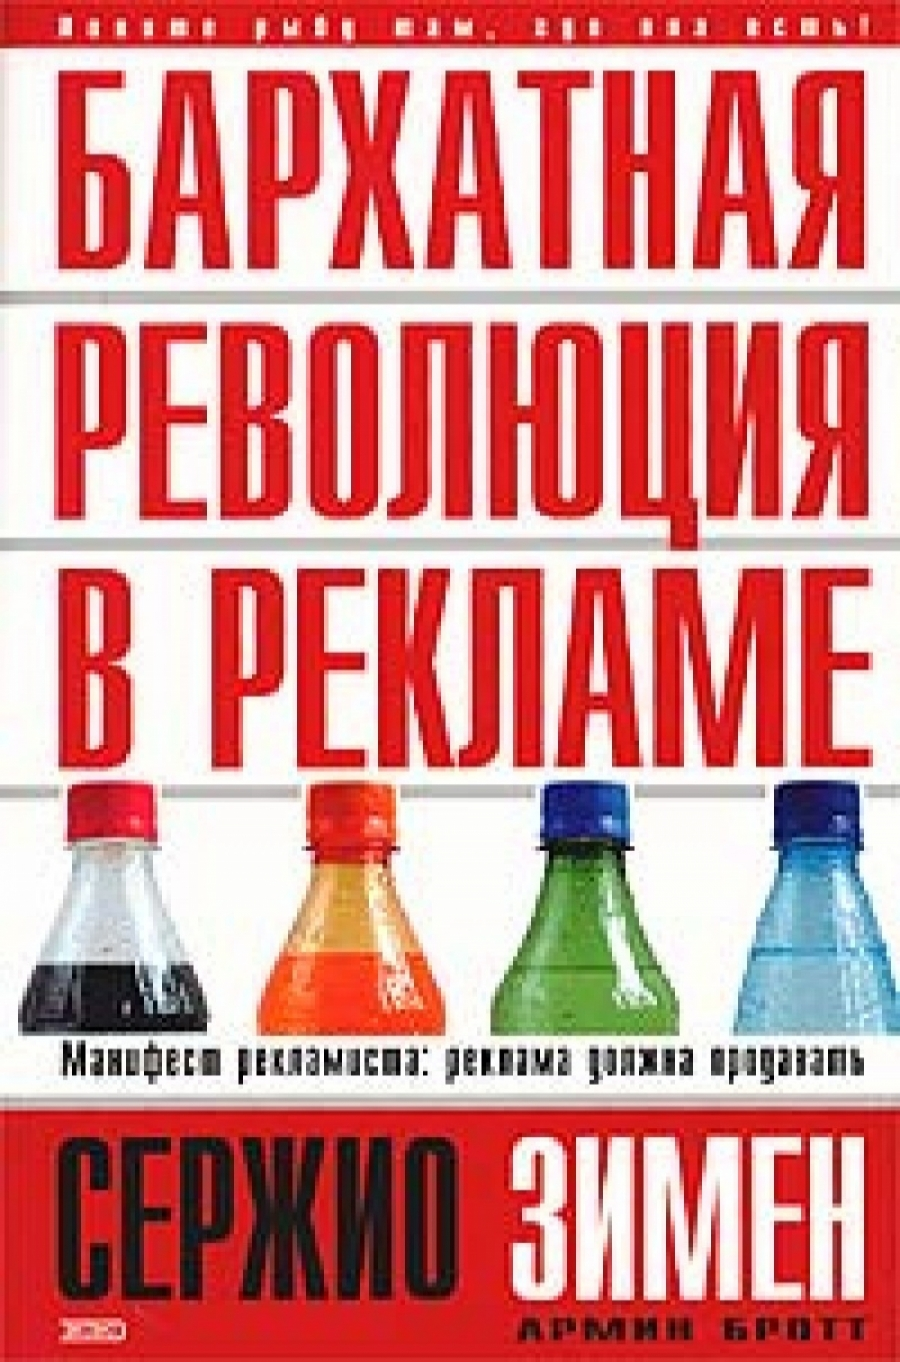 Обложка книги:  зимен с., бротт а. - бархатная революция в рекламе.